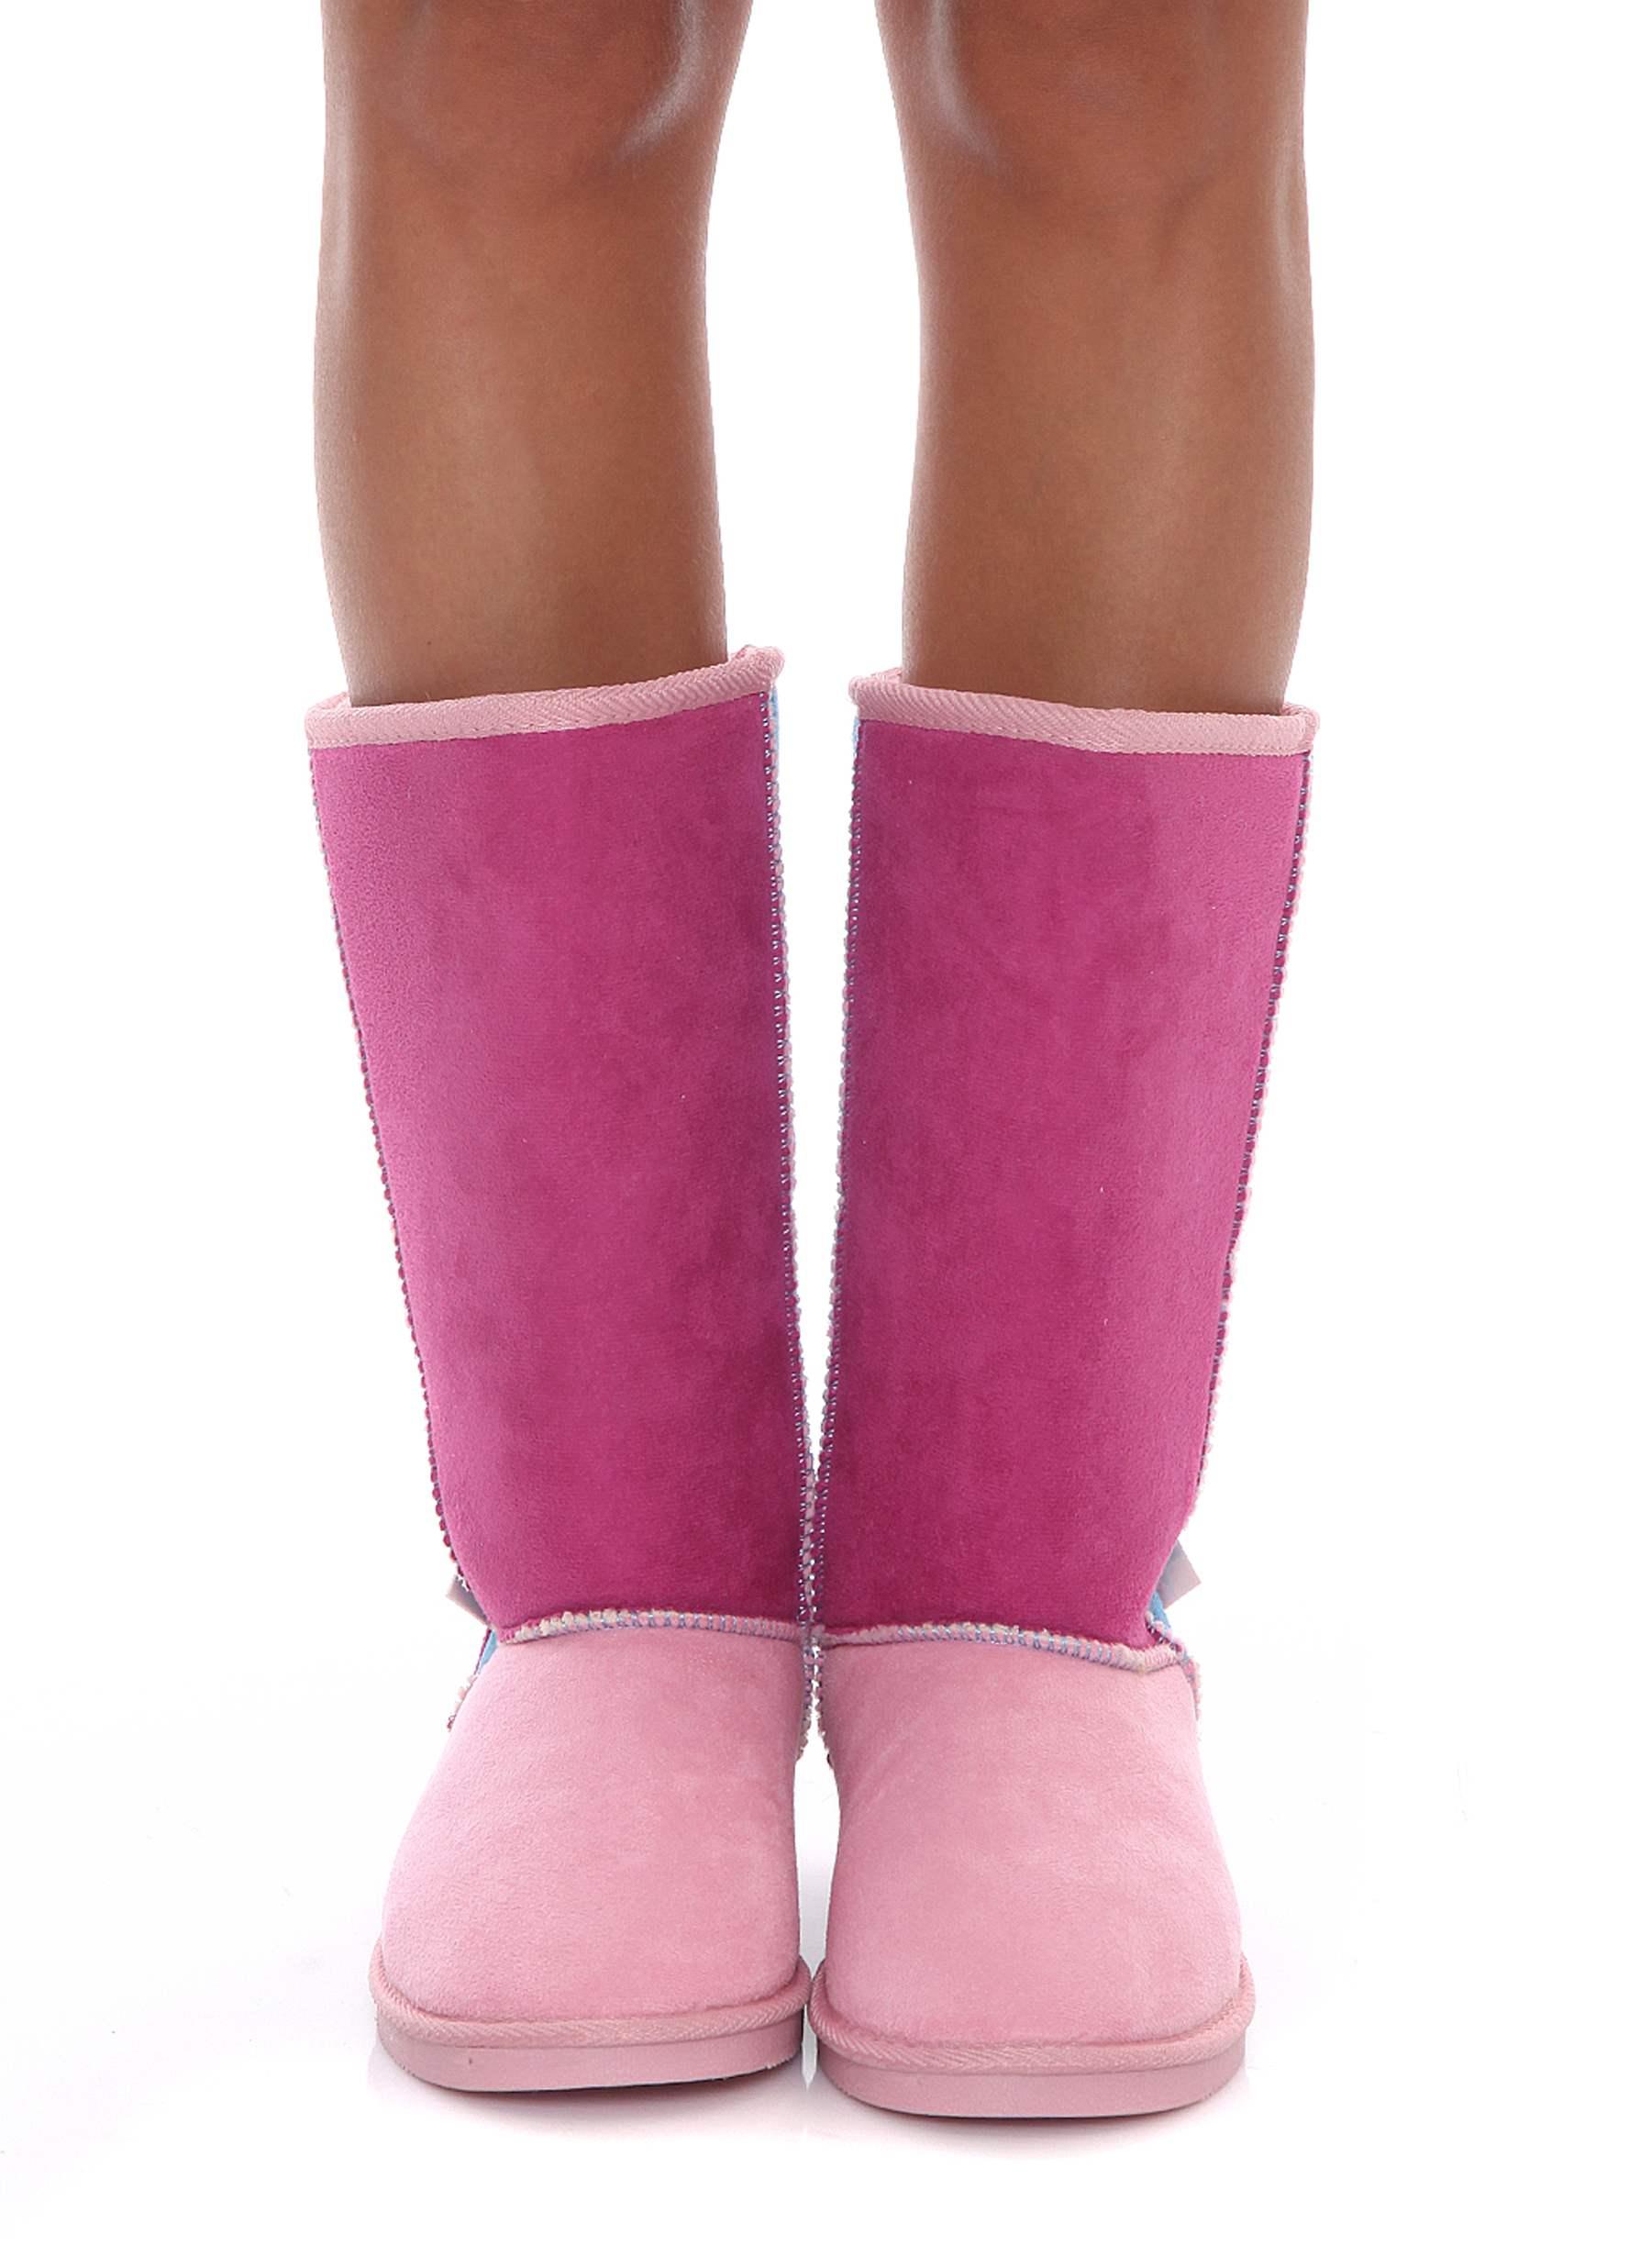 I-Doll Boots - Γυναικεία Μποτάκια I-DOLL